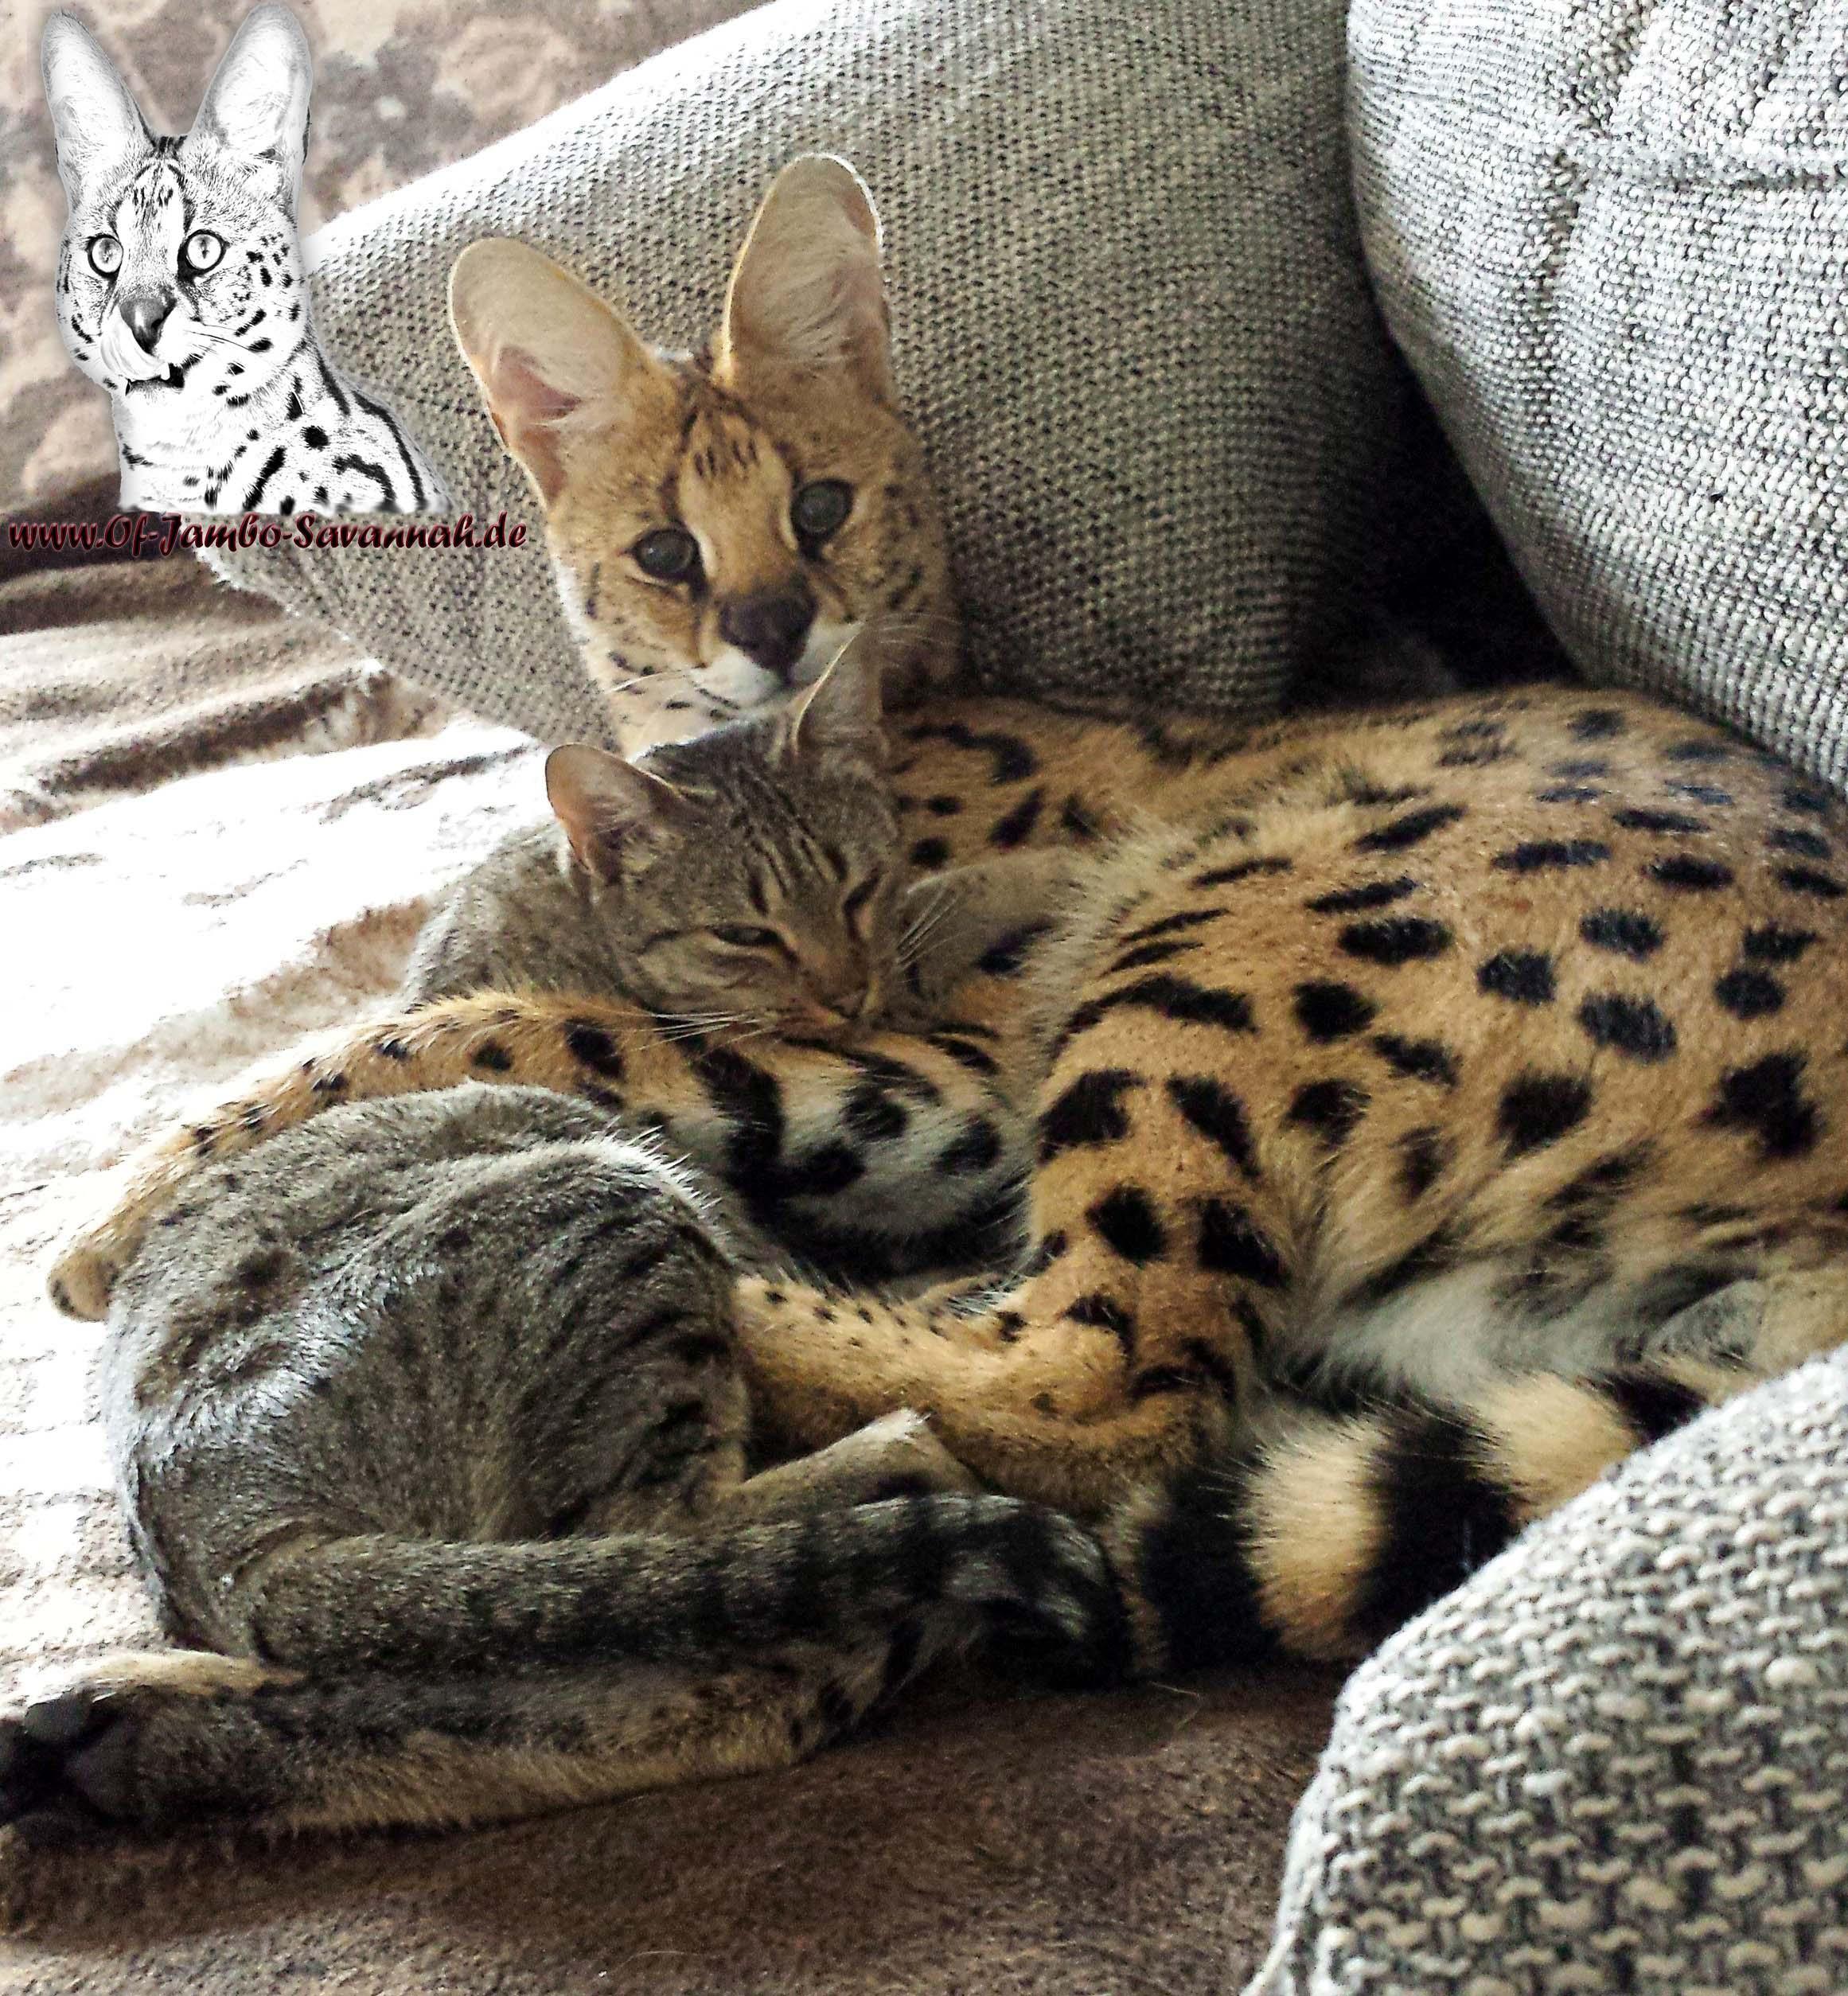 serval und savannah katze am schmusen of jambo savannah cats. Black Bedroom Furniture Sets. Home Design Ideas